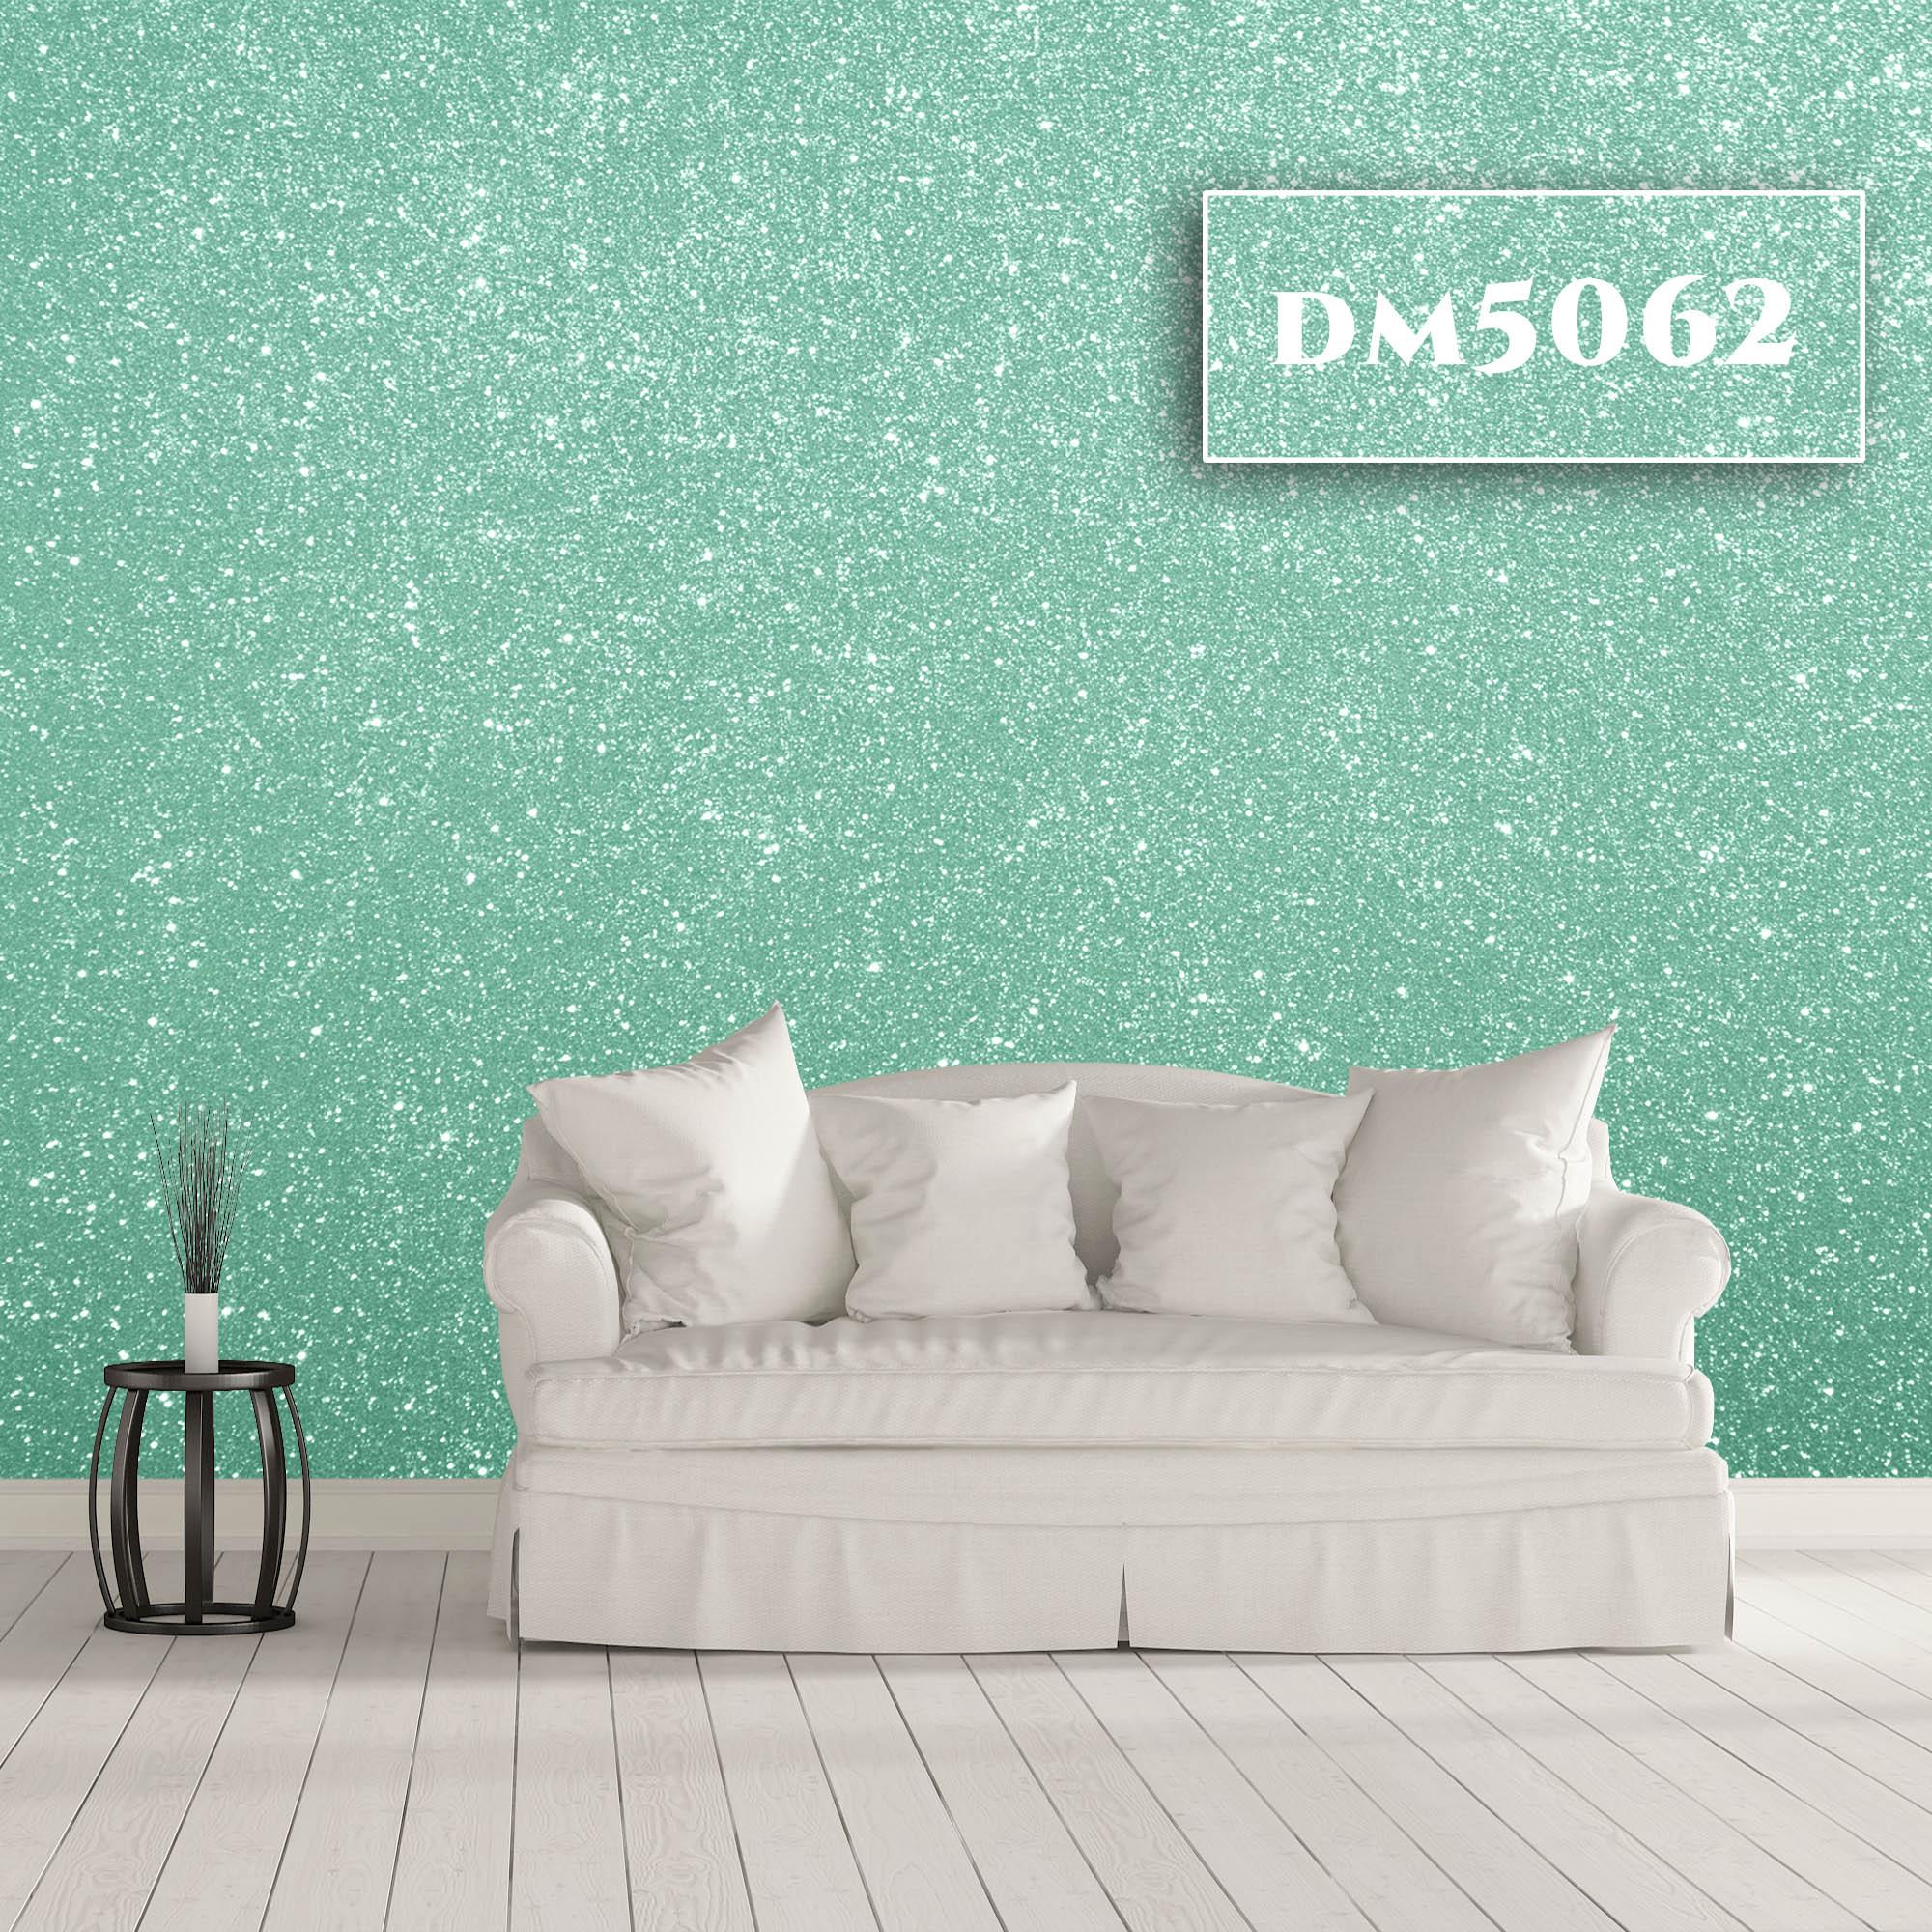 DM5062